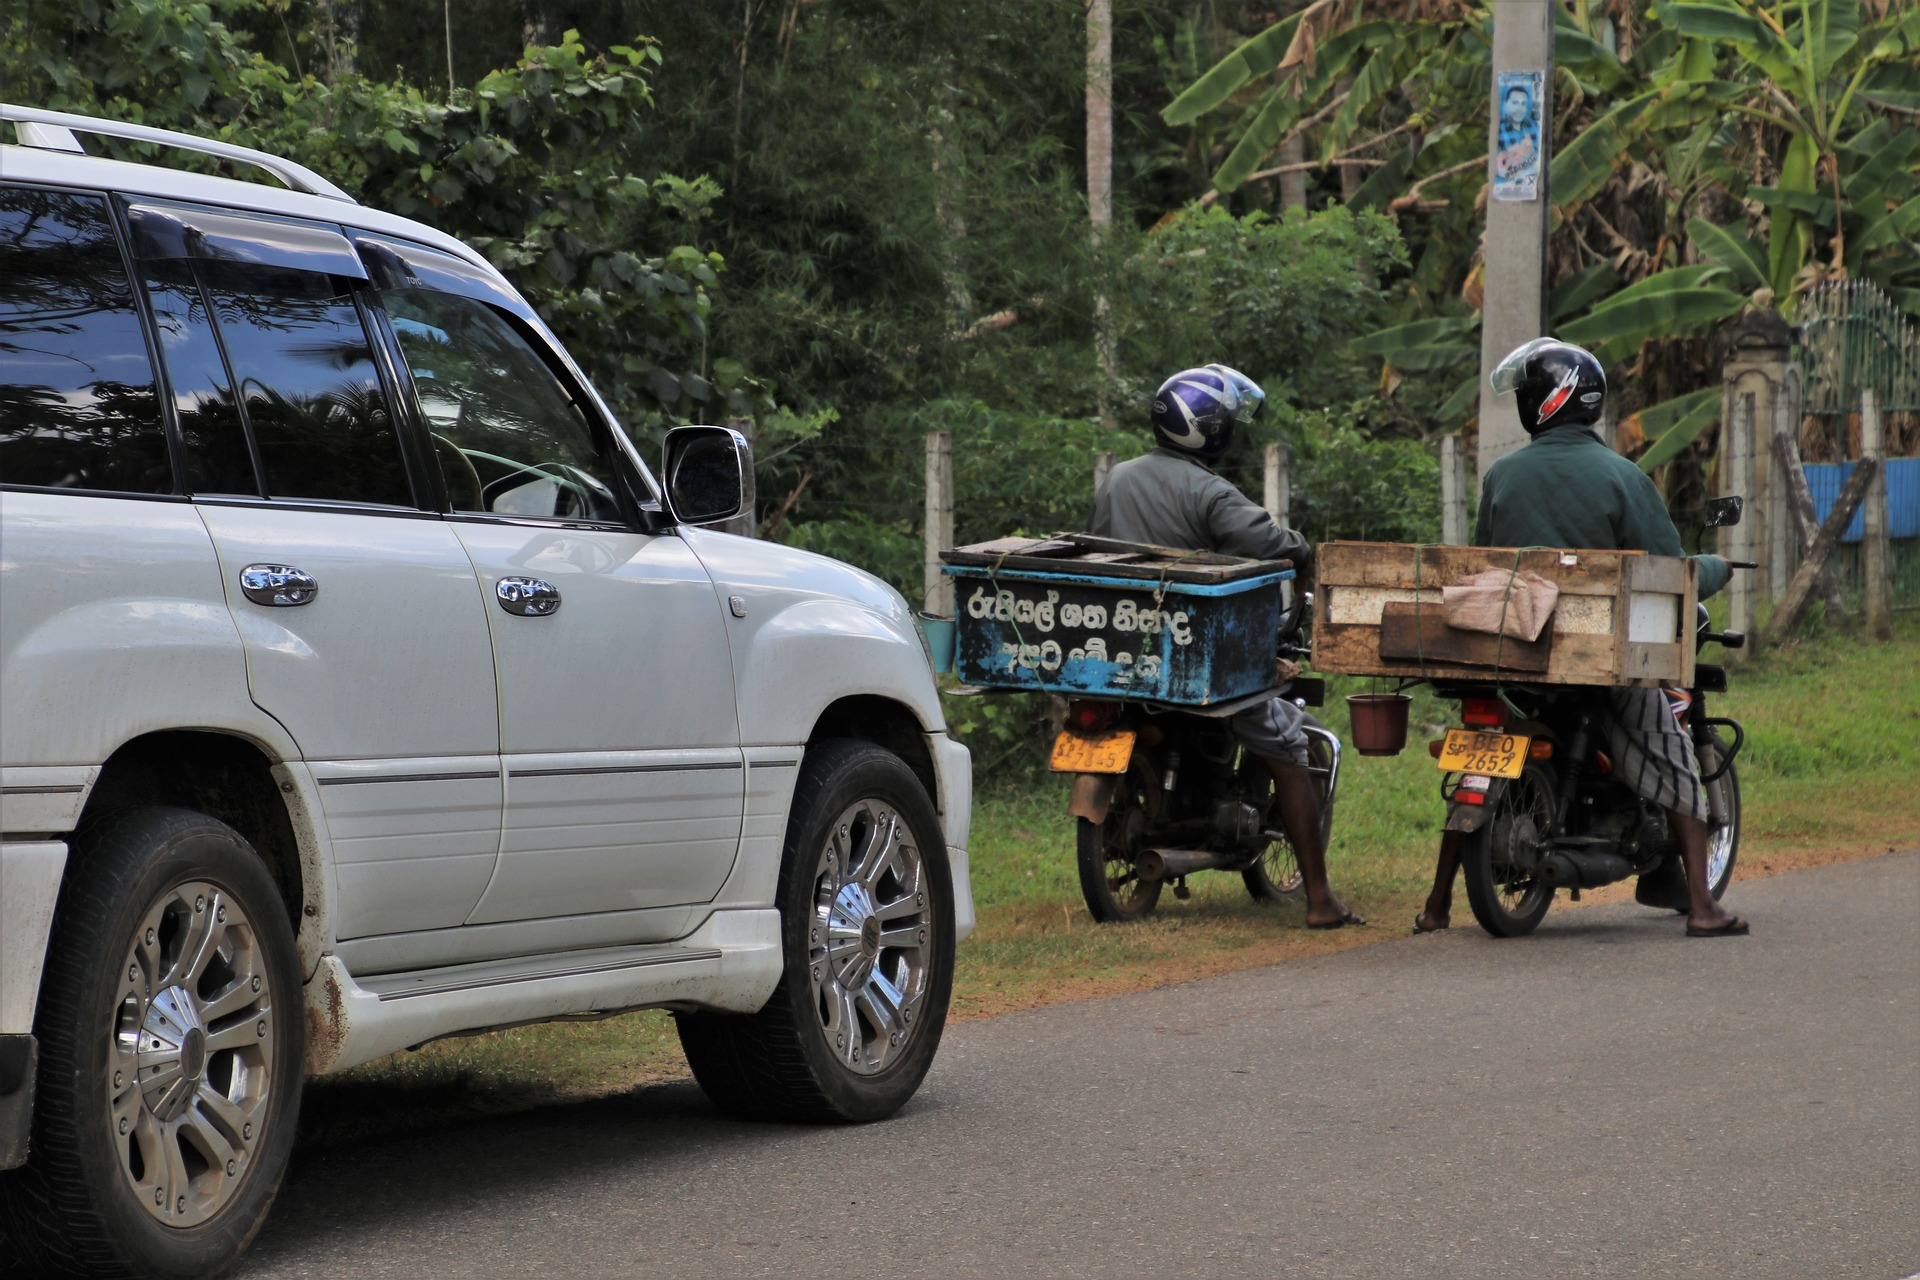 Location de voiture au Sri Lanka